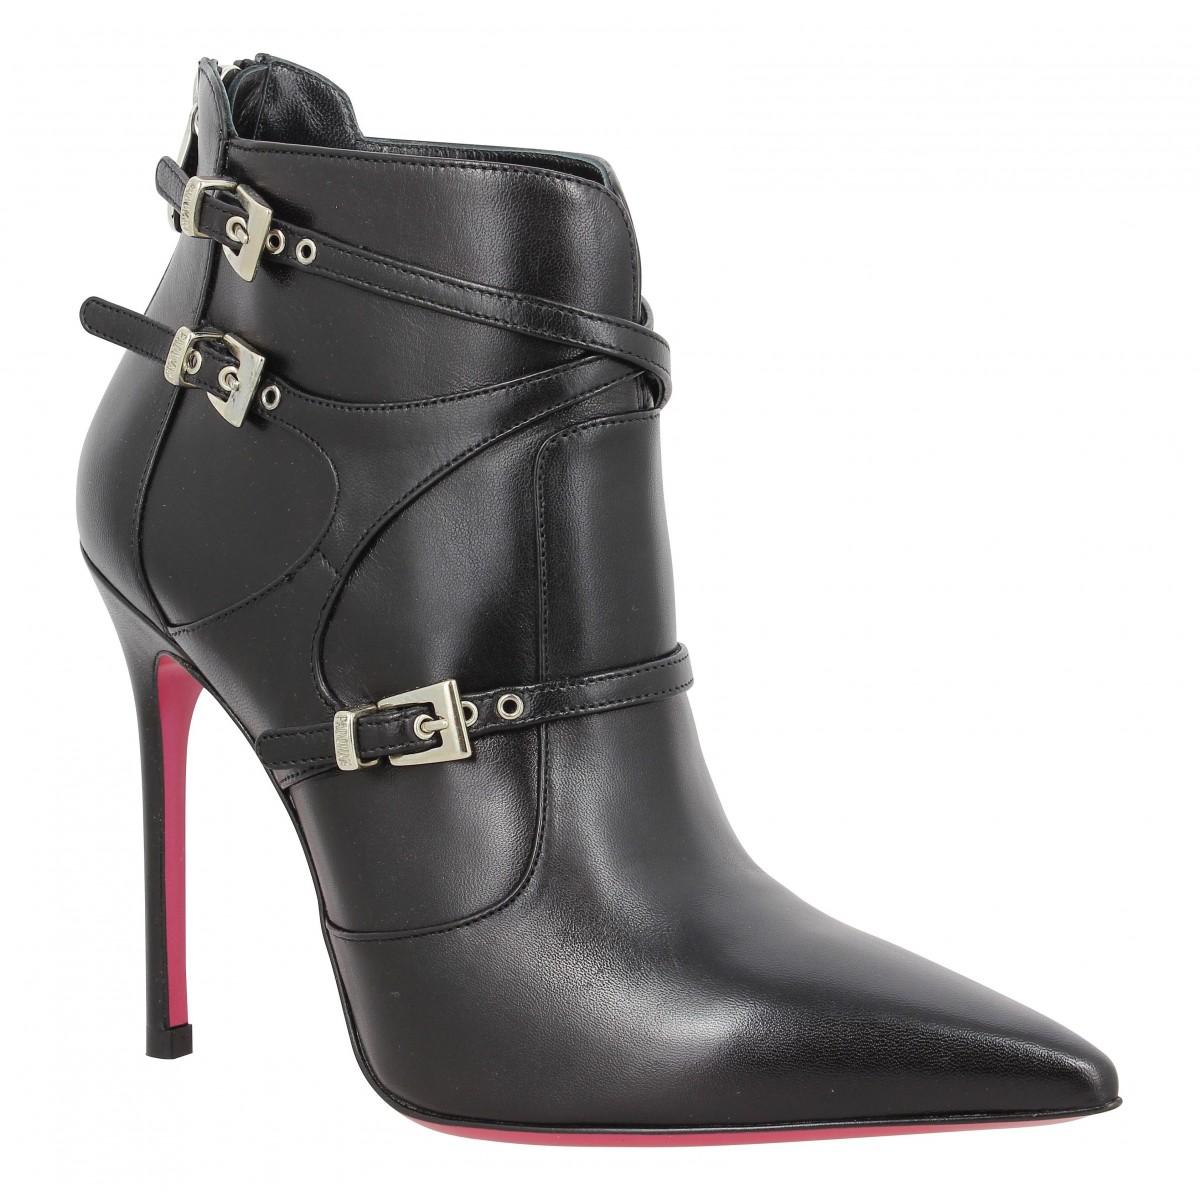 Bottines LUCIANO PADOVAN 155 cuir Femme Noir